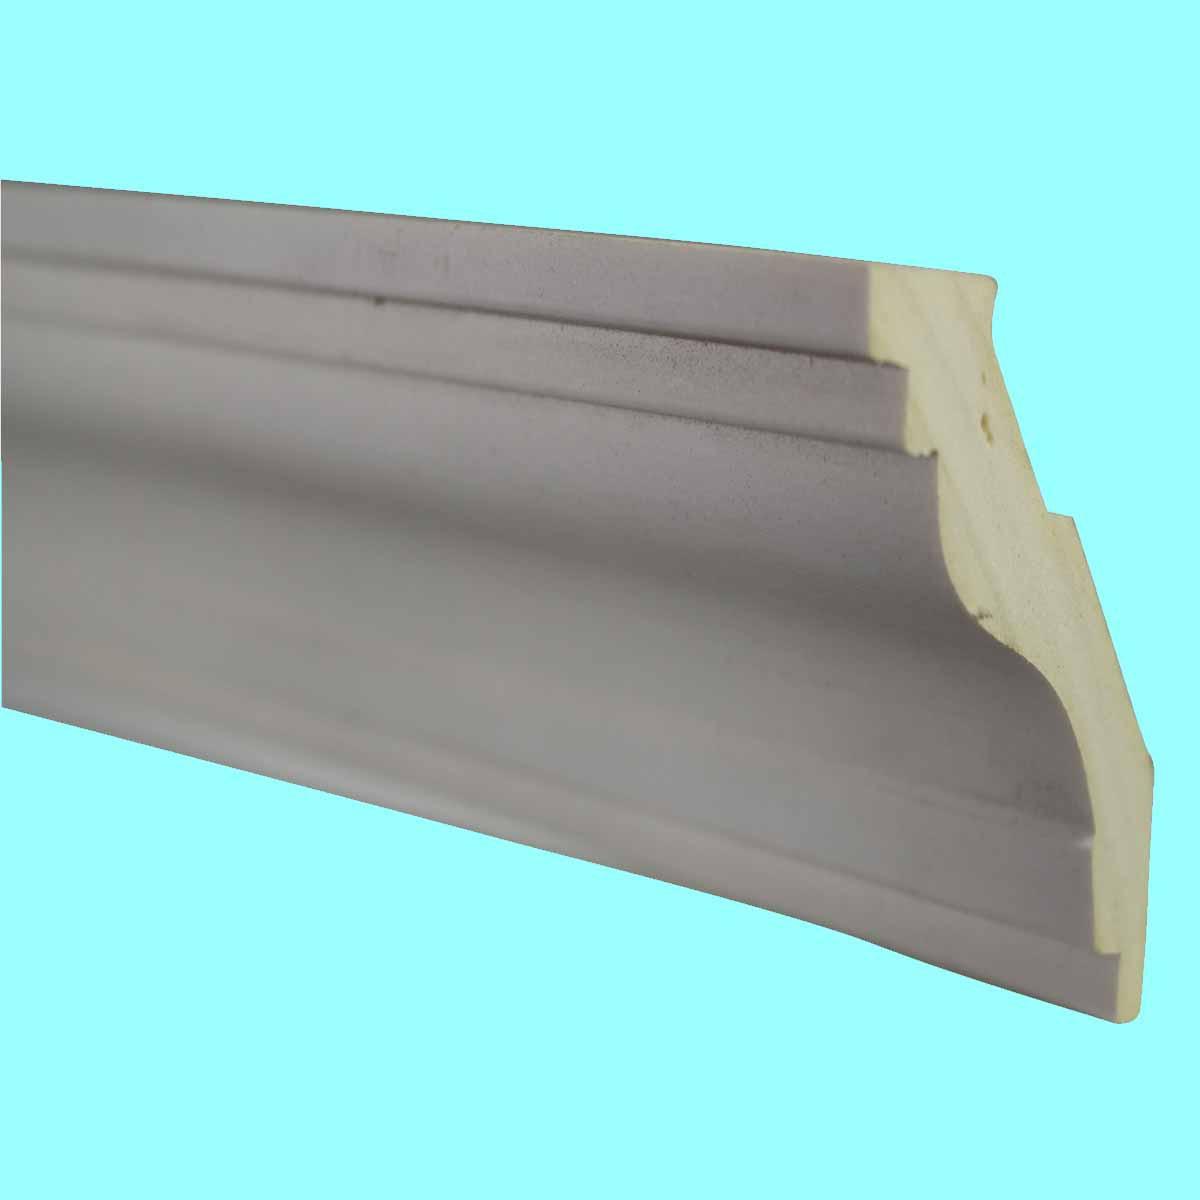 Cornice White Urethane Sample of 11470 23.5 Long Cornice Cornice Moulding Cornice Molding